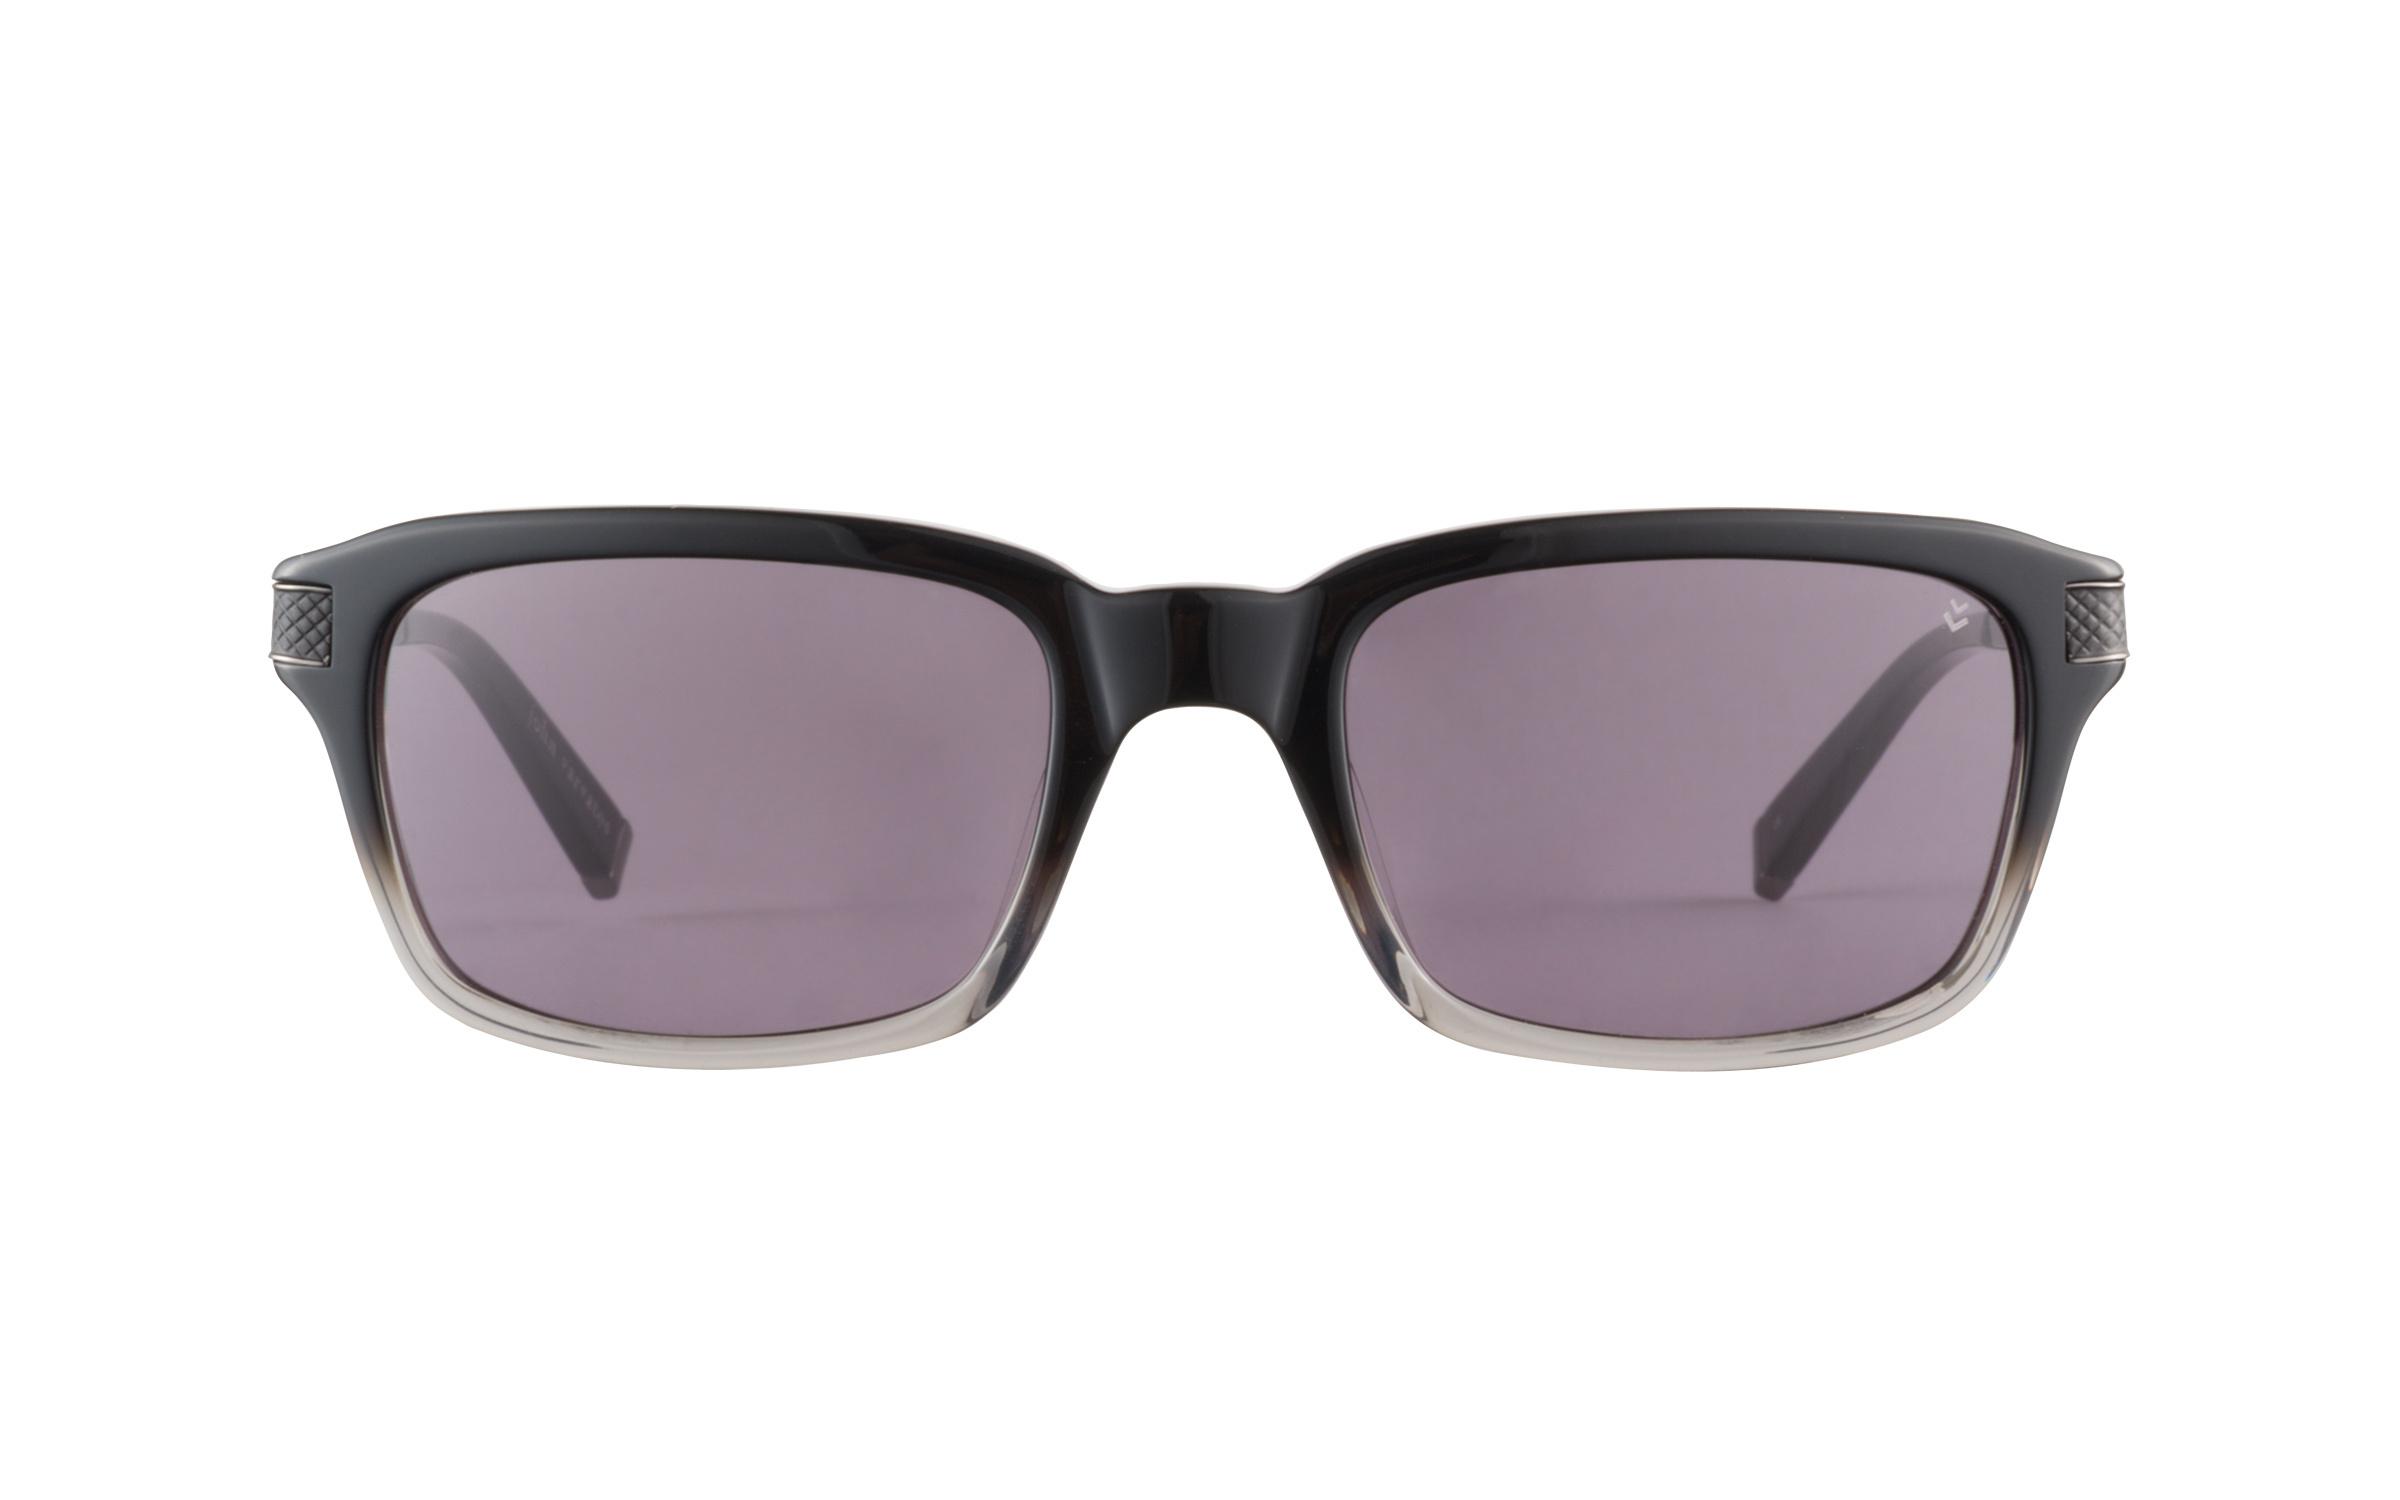 John_Varvatos_Sunglasses_Classic_Black_AcetateMetal_Online_Coastal